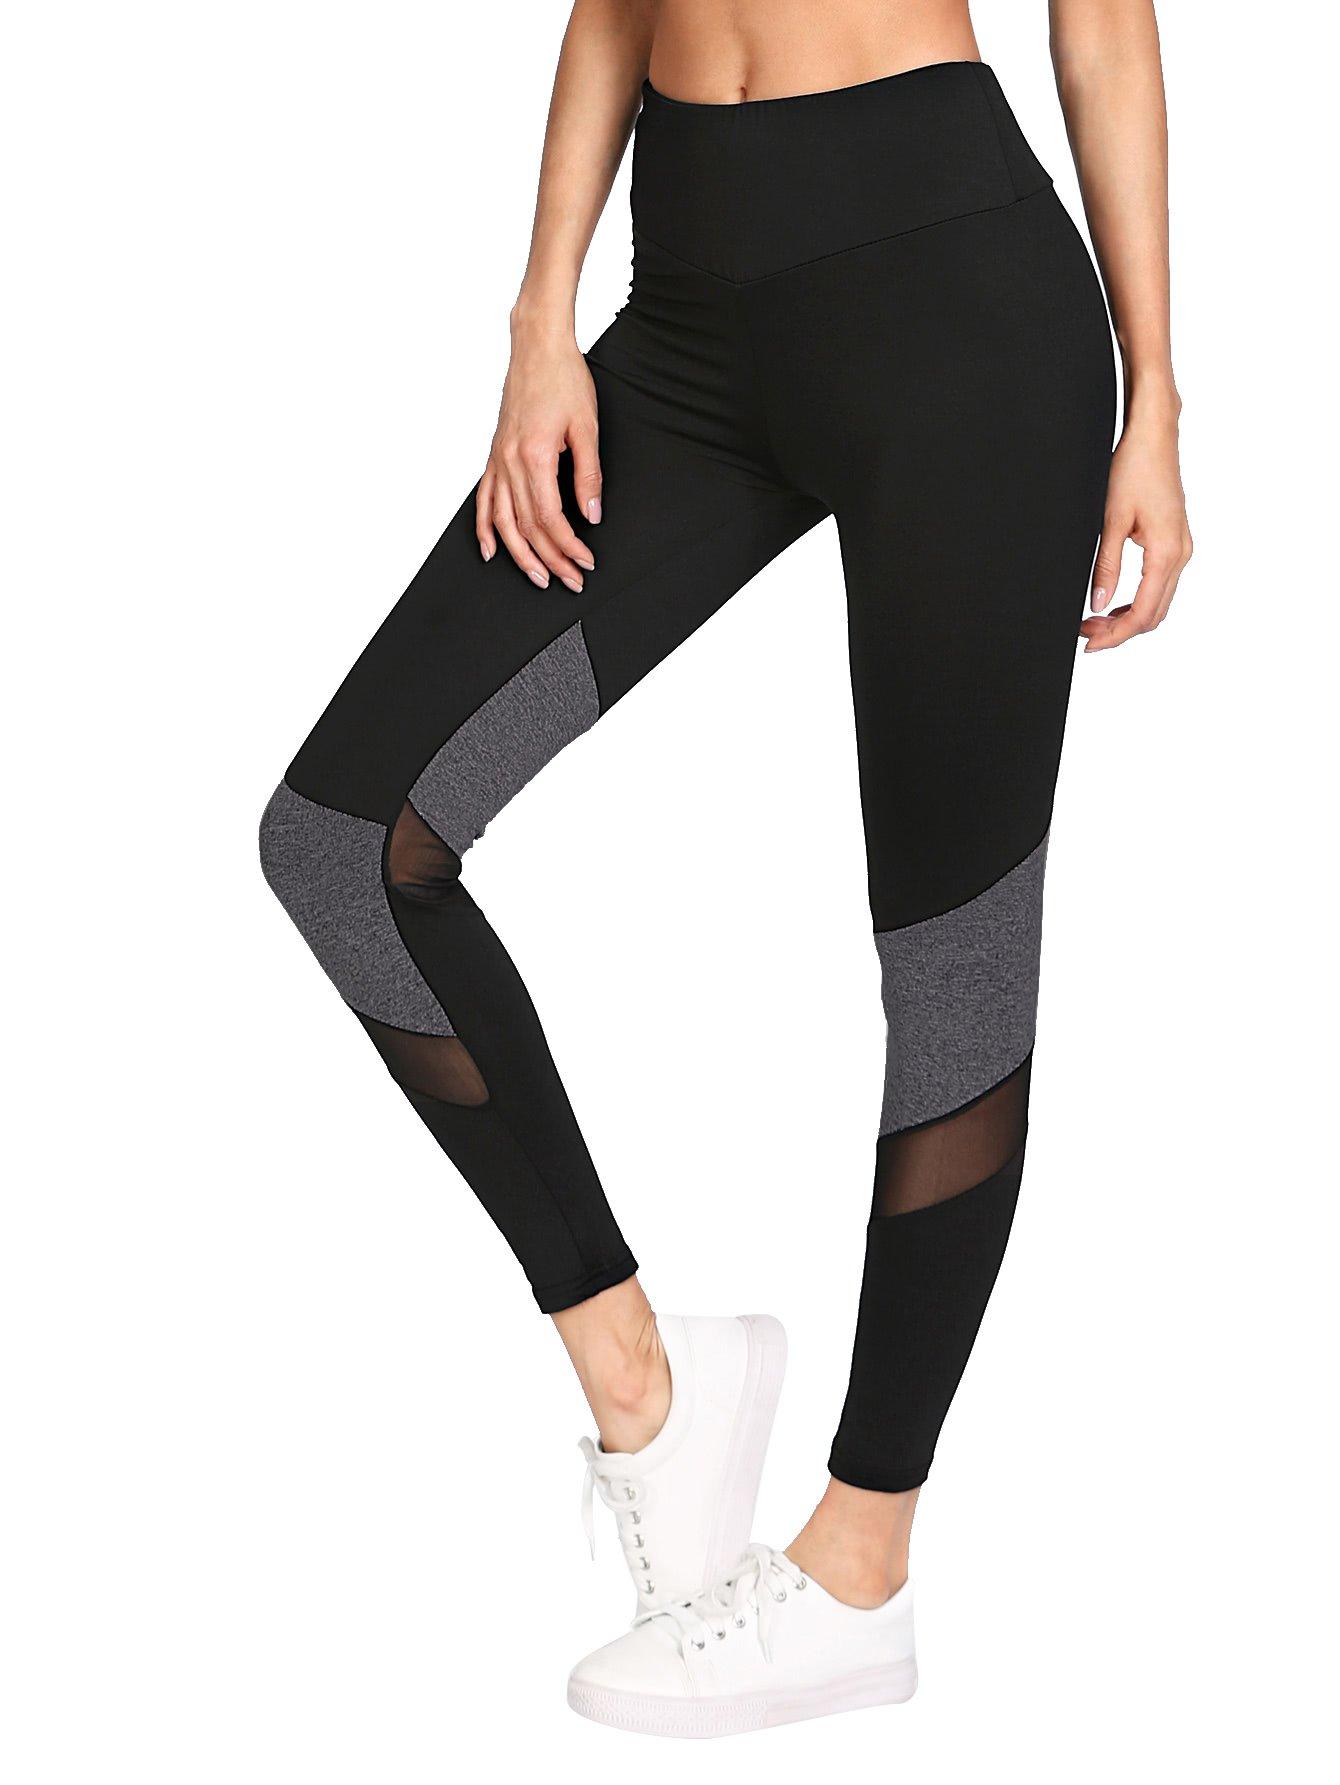 weatyRocks Women's Stretchy Skinny Sheer Mesh